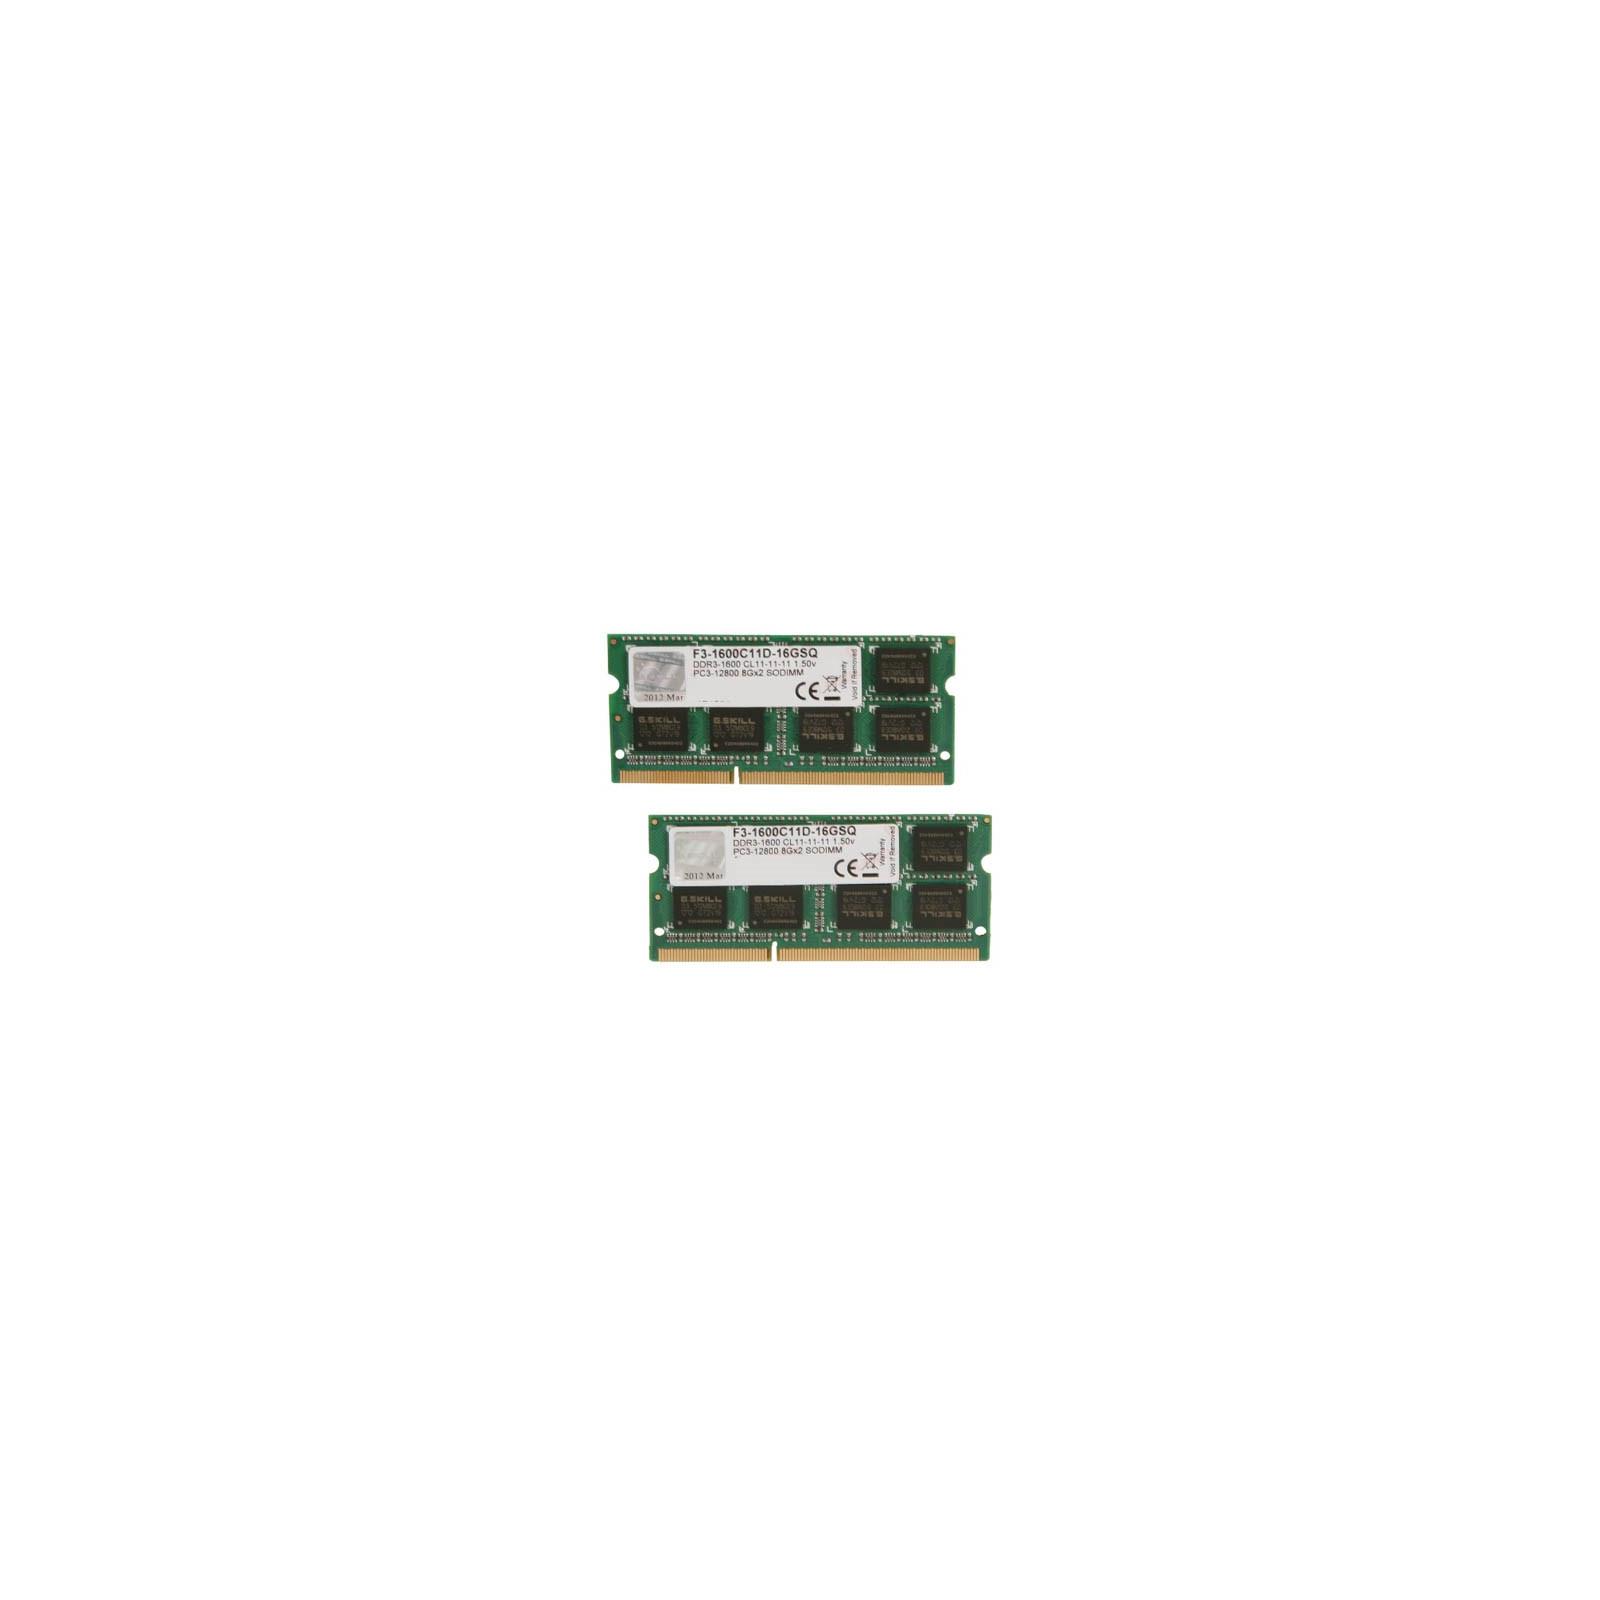 Модуль памяти для ноутбука SoDIMM DDR3 16GB (2x8GB) 1600 MHz G.Skill (F3-1600C11D-16GSQ)